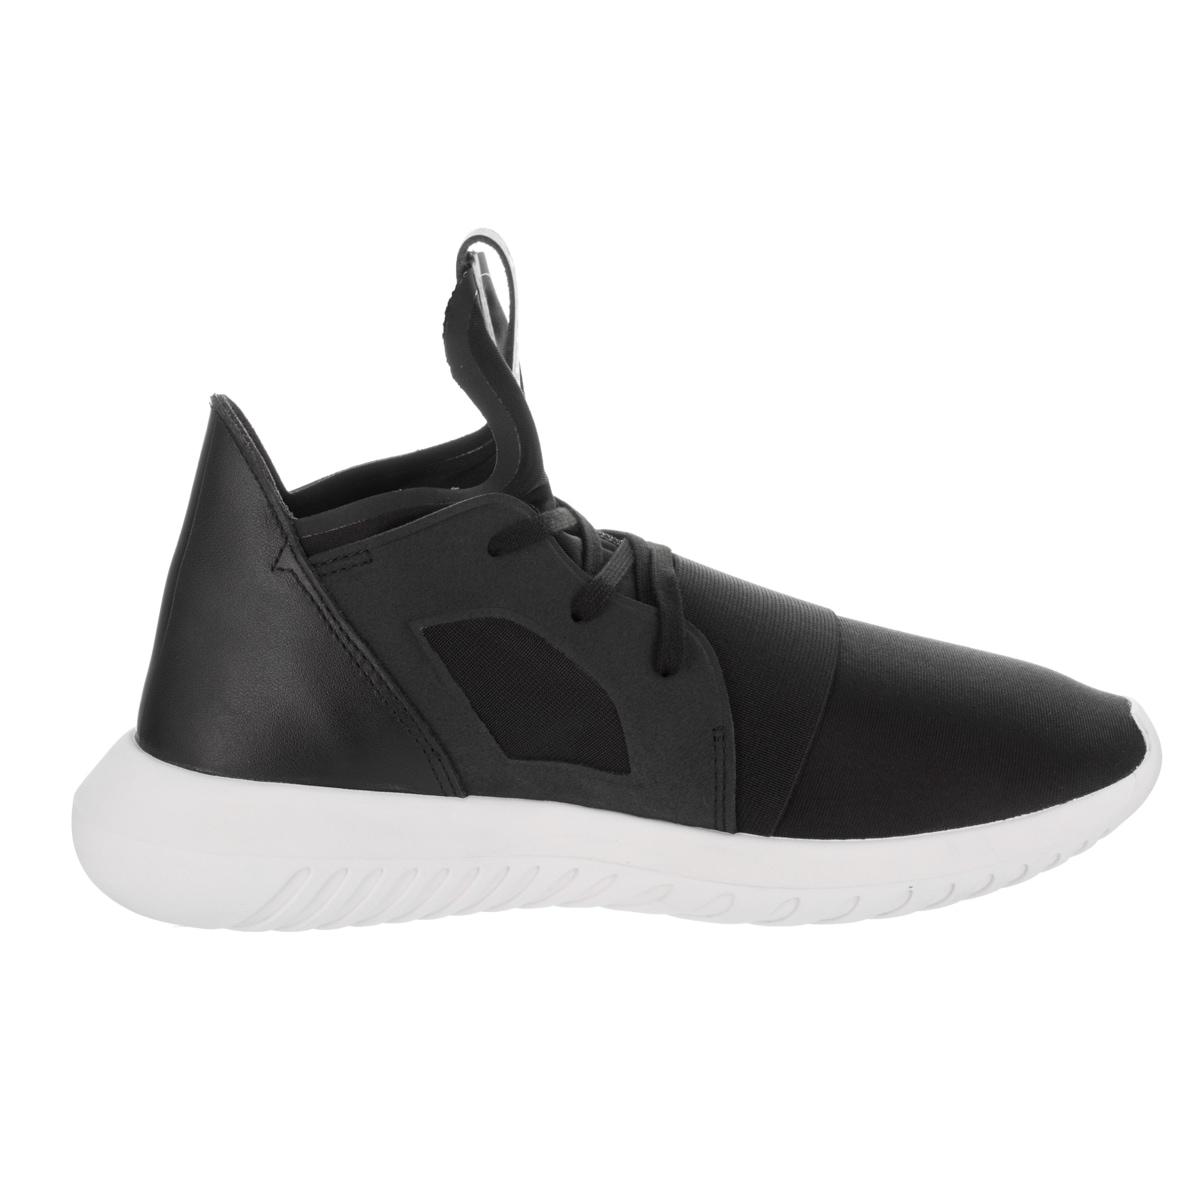 check out 5ea74 23e9f Adidas Women's Tubular Defiant Originals Running Shoe